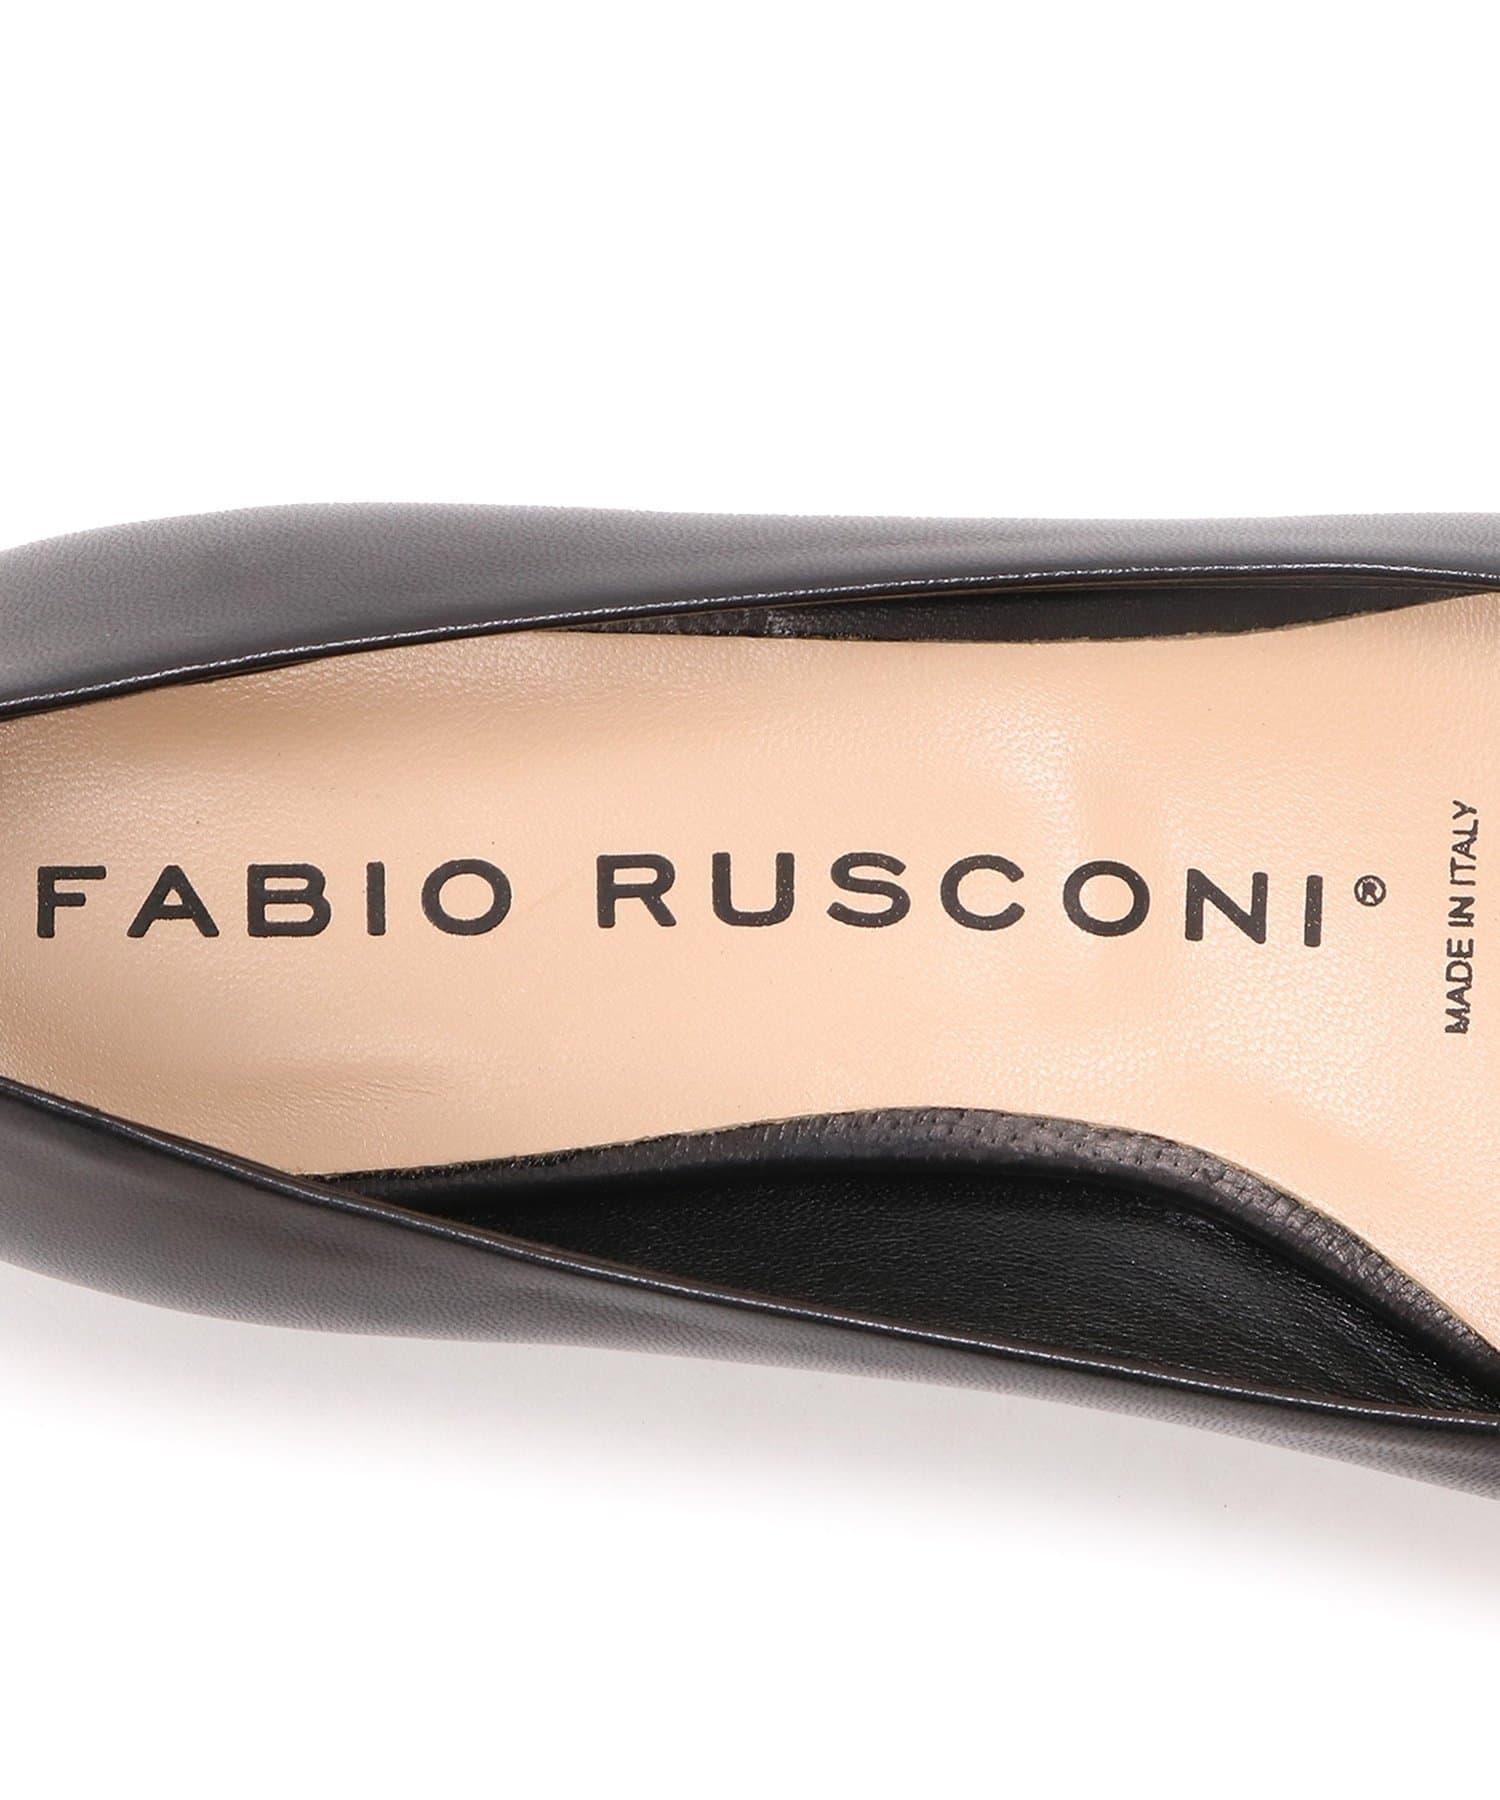 Loungedress(ラウンジドレス) 【FABIO RUSCONI/ファビオ ルスコーニ】ポインテッドパンプス